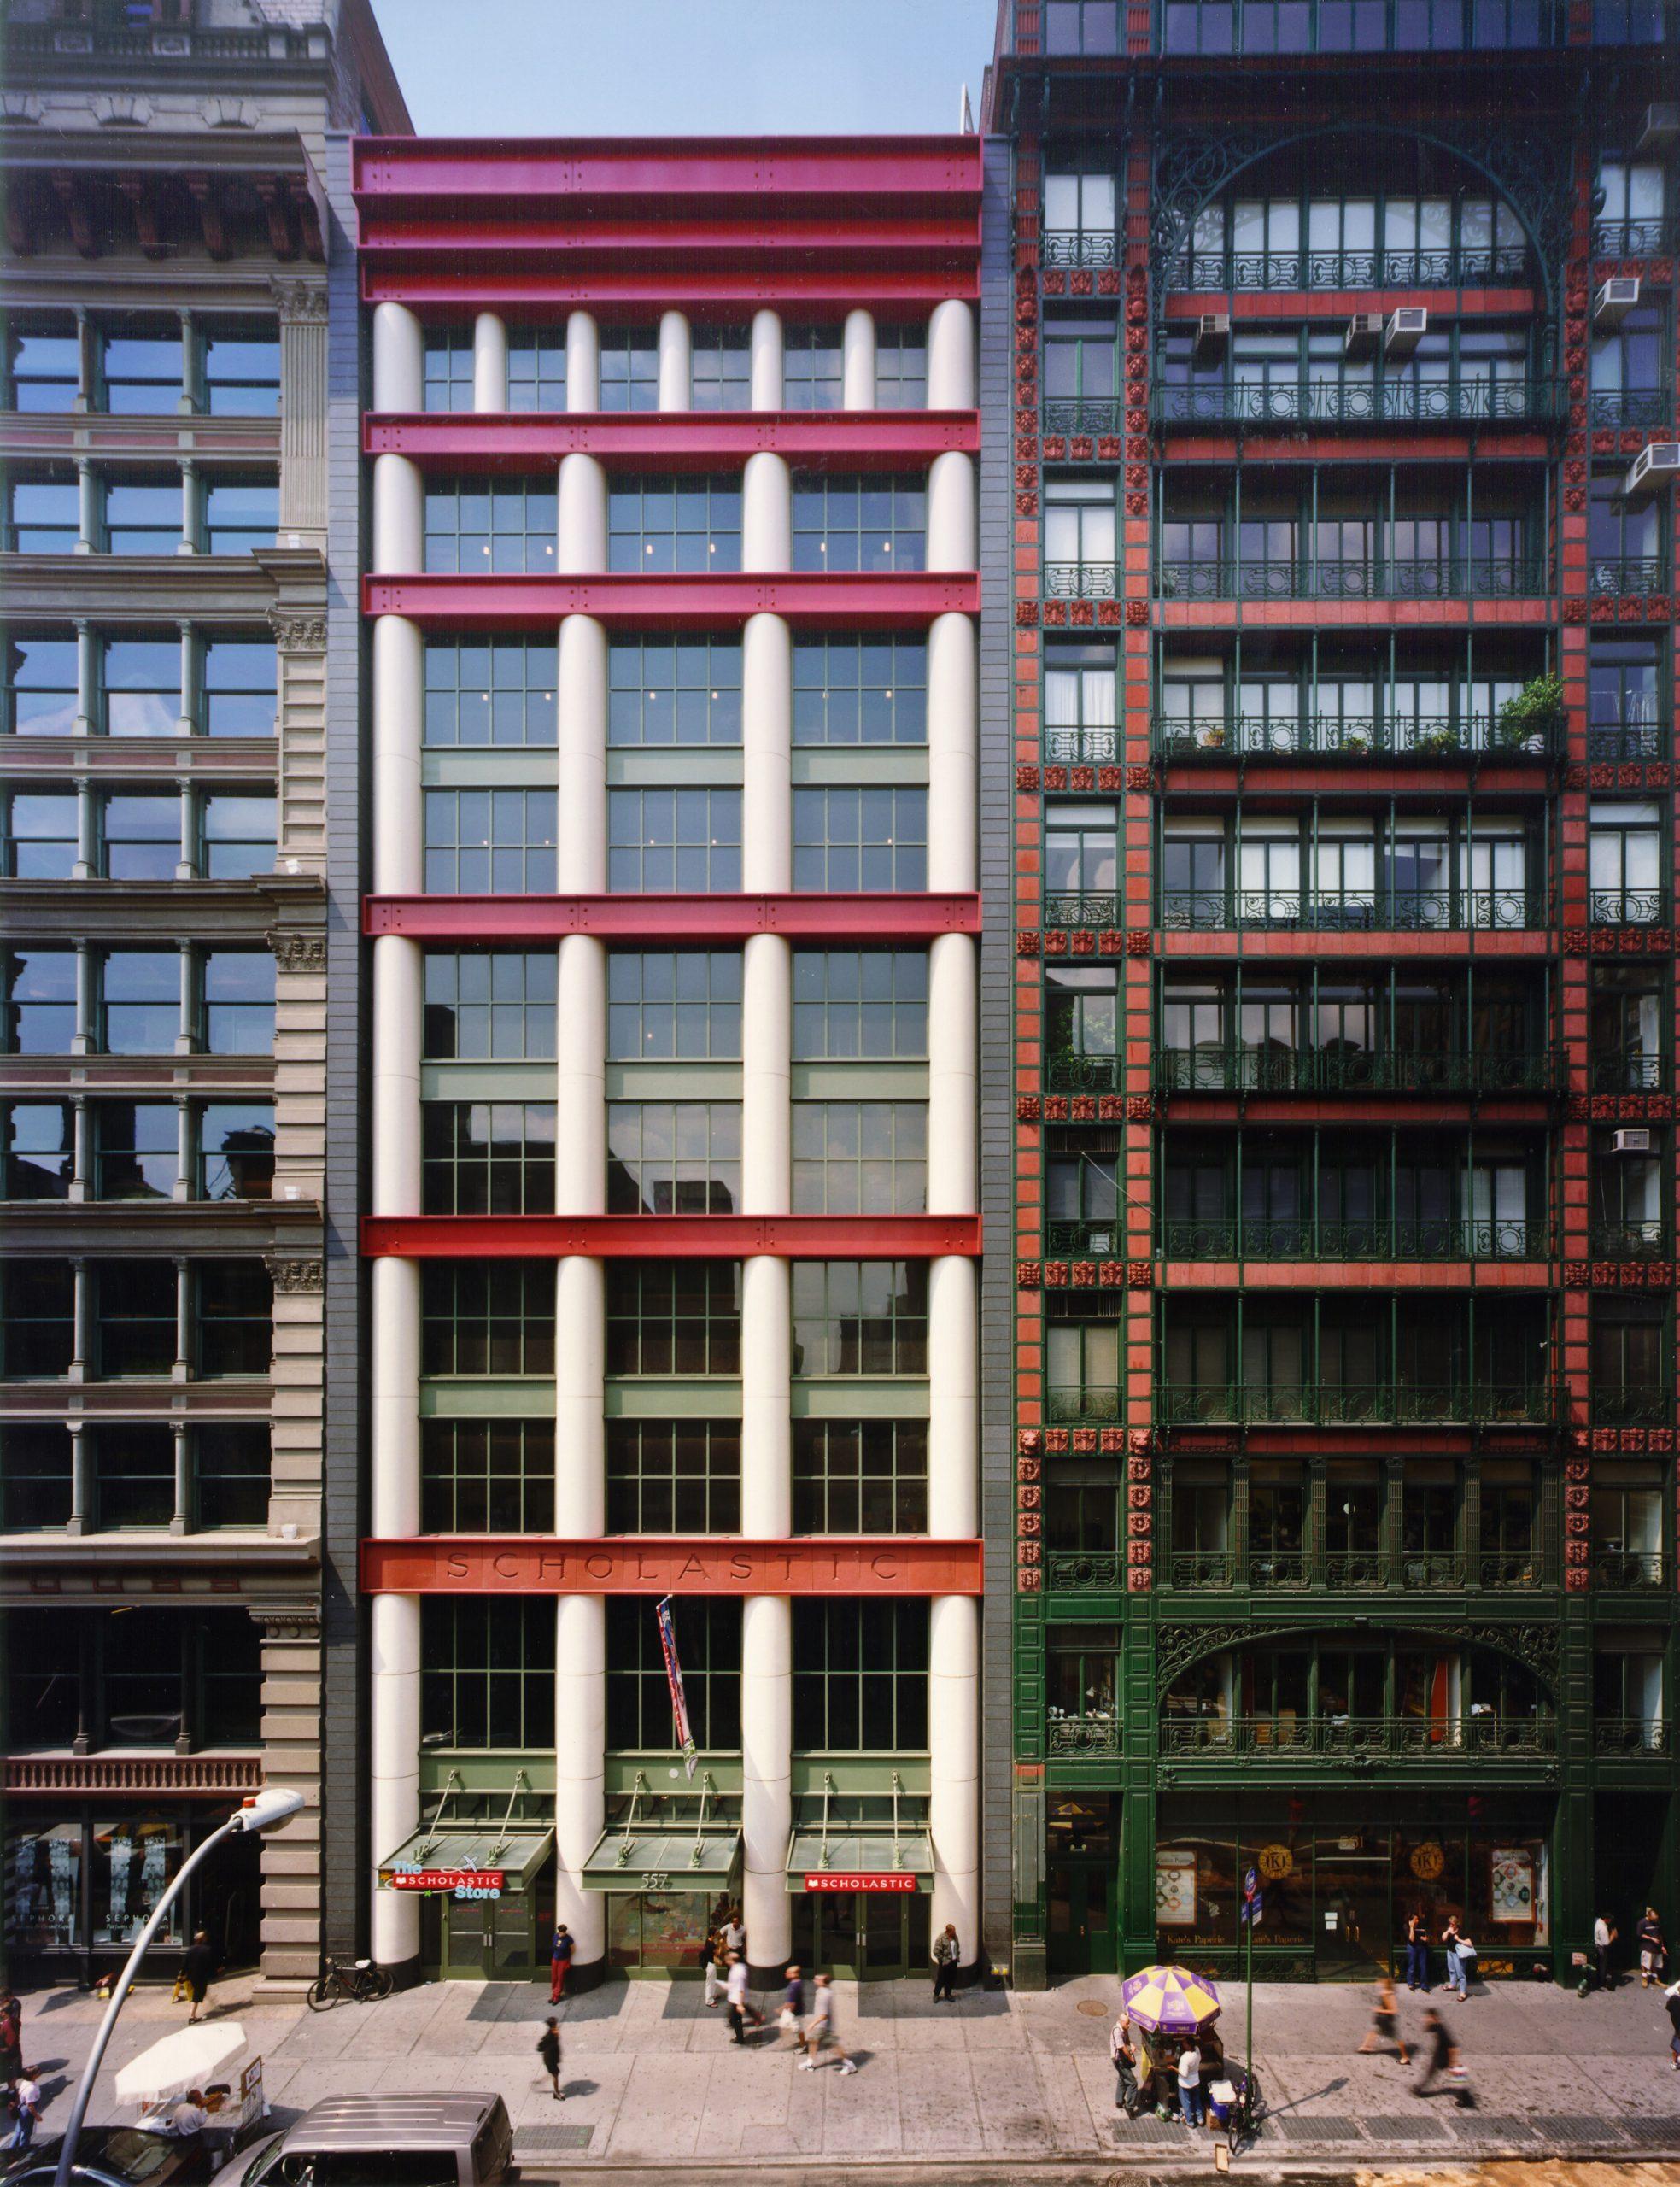 Aldo Rossi building on Broadway, New York